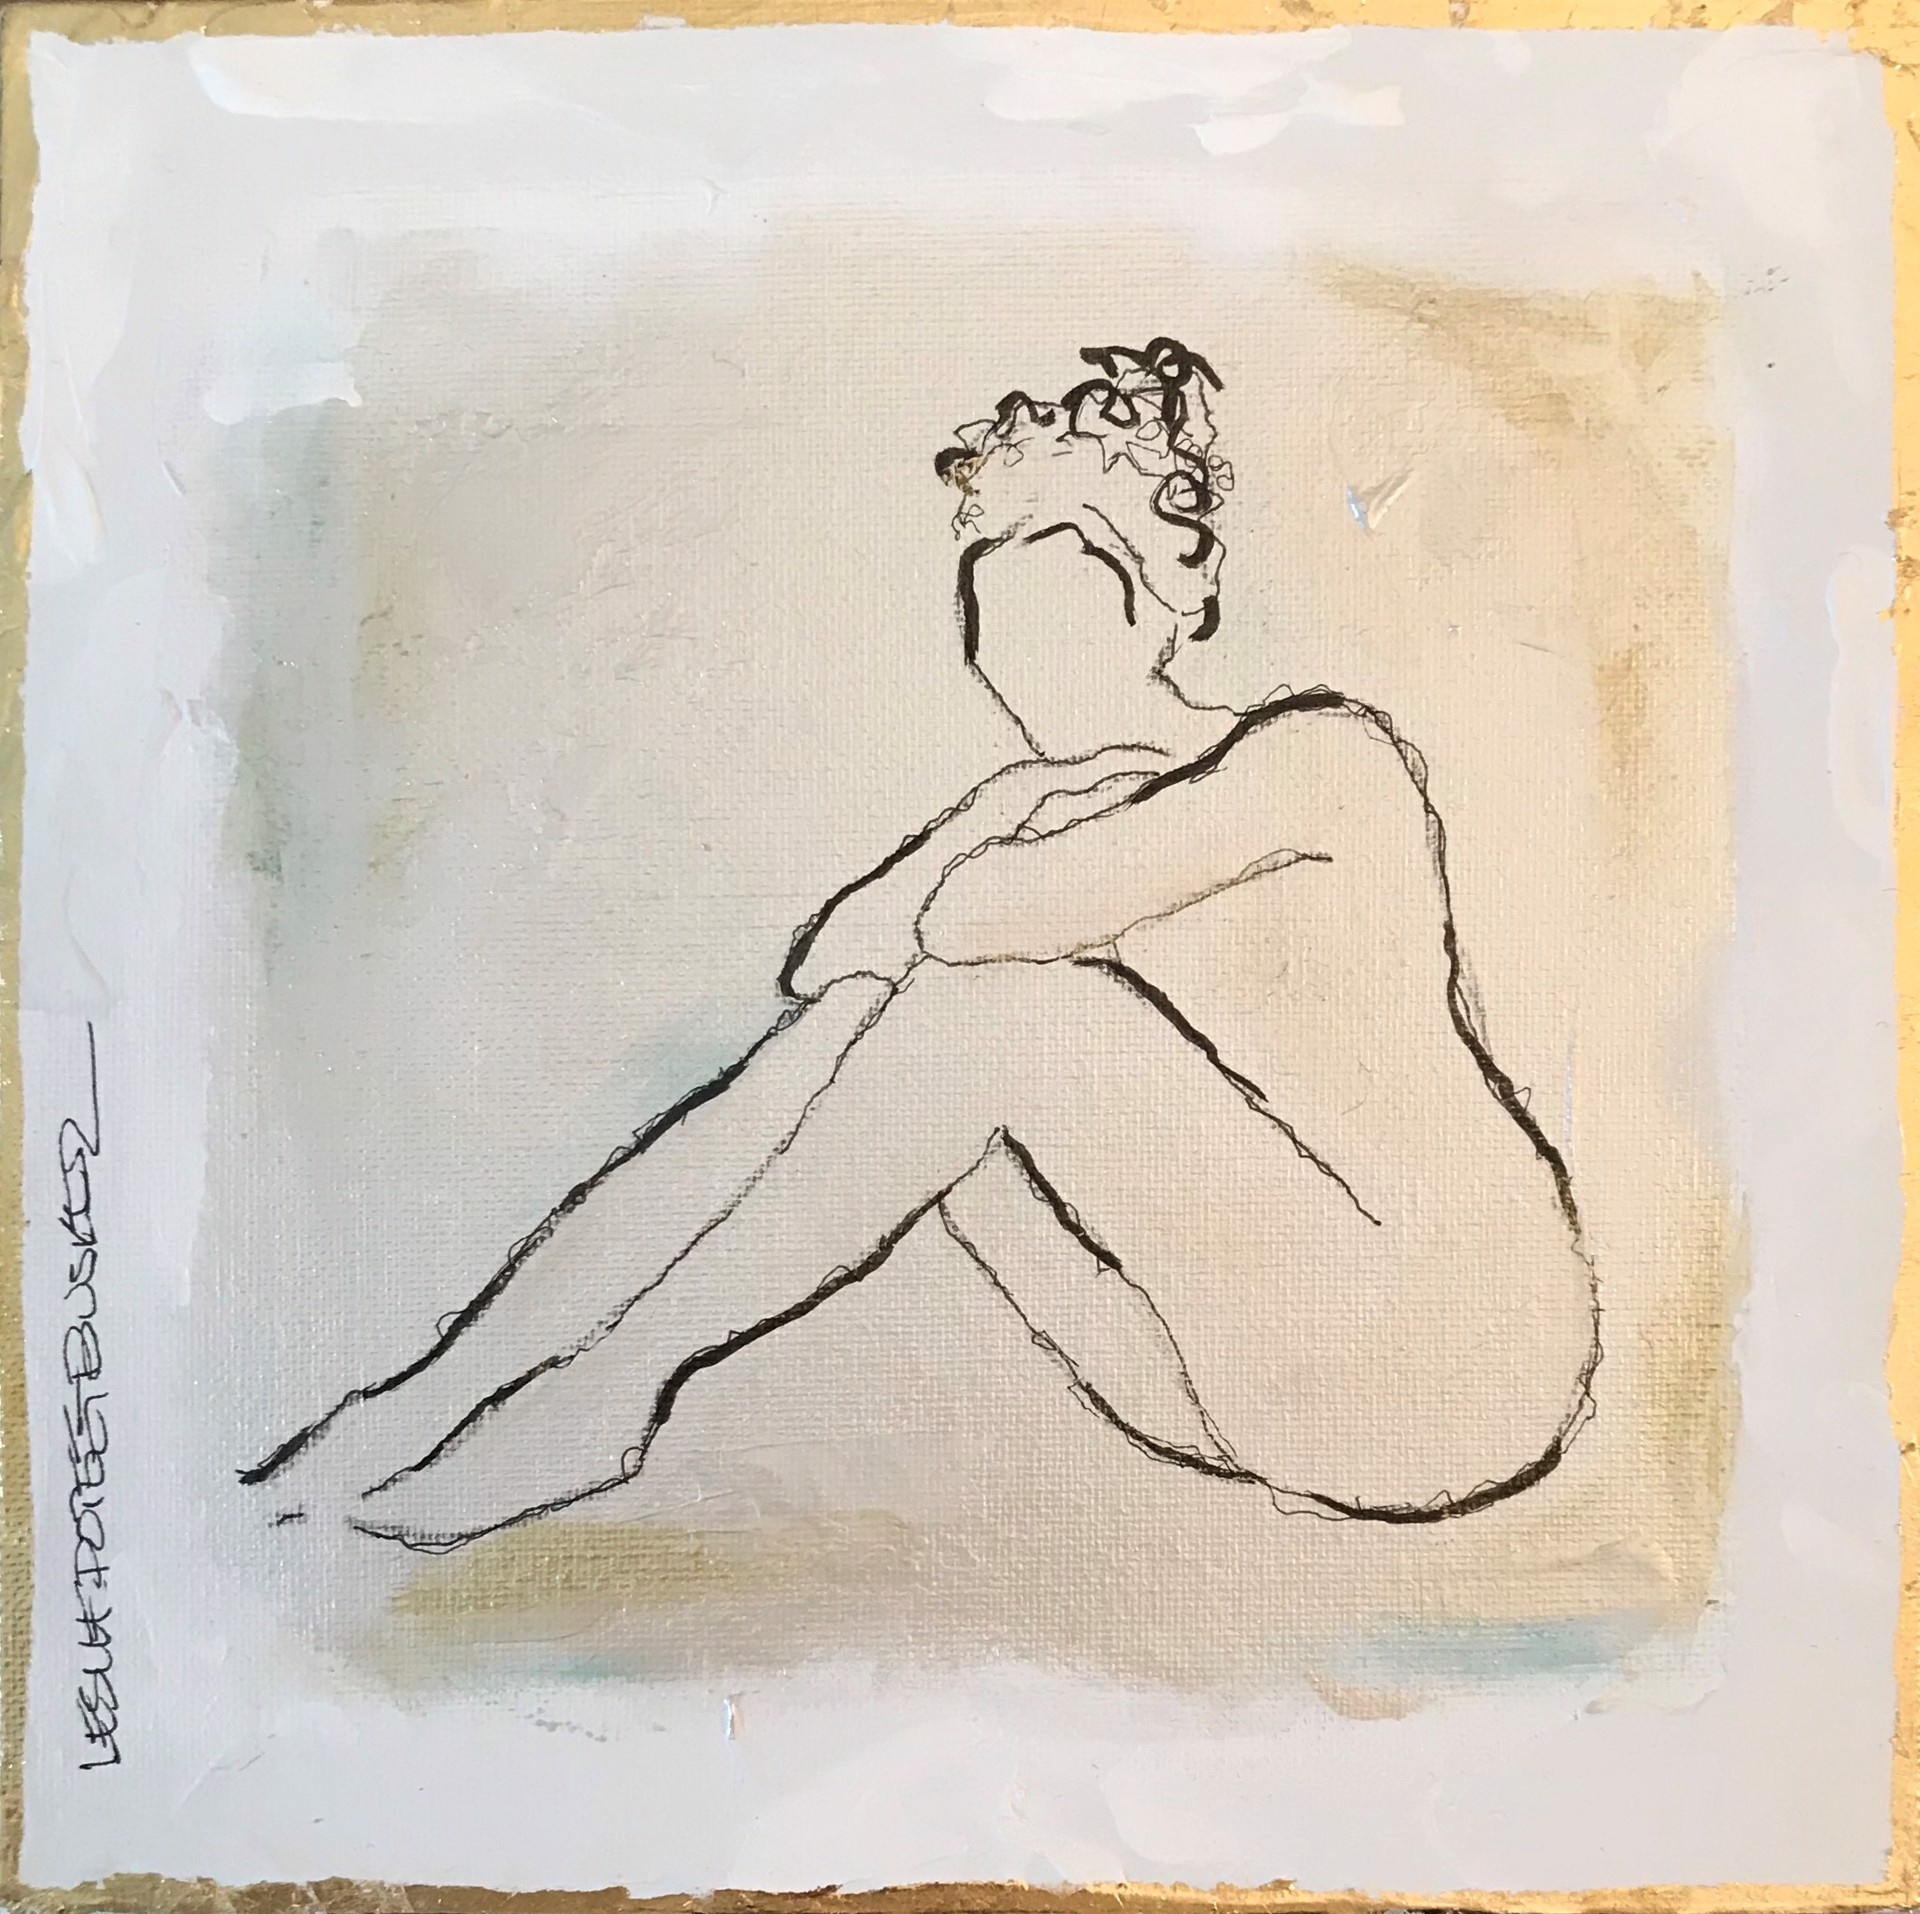 Figure No. 105 by Leslie Poteet Busker